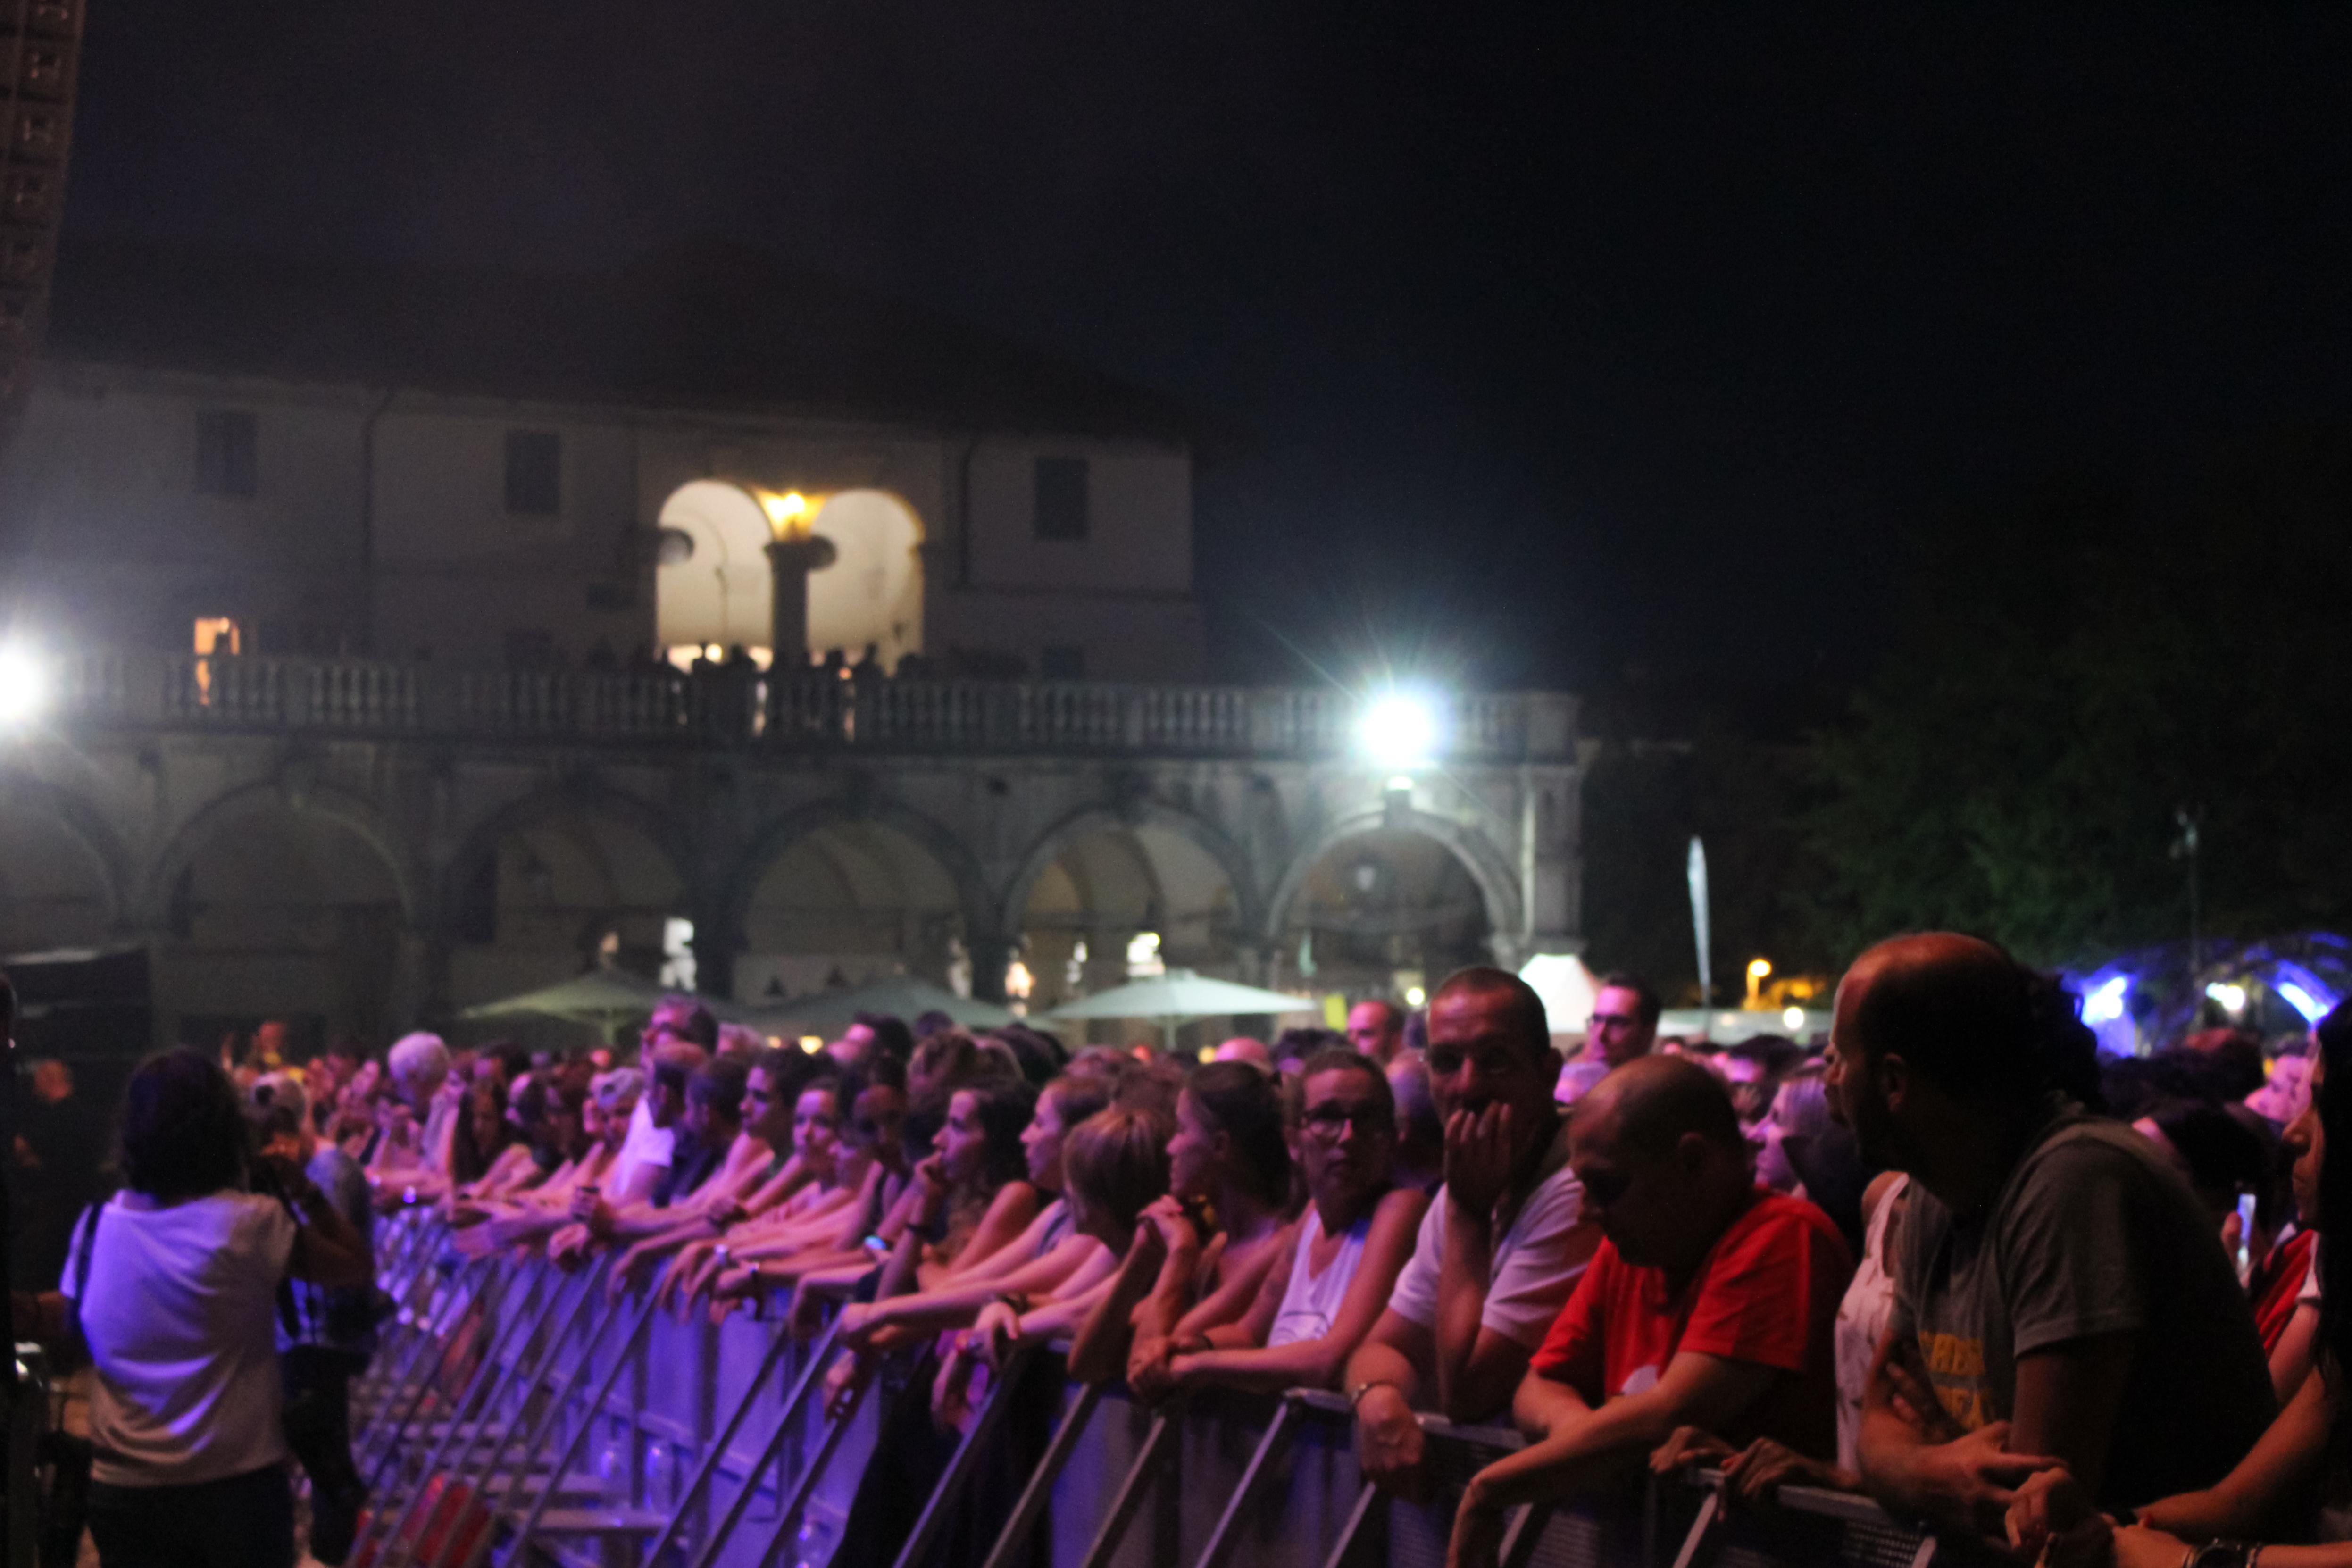 Skunk Anansie - Padova 17.7.2016 - ph Mauro De Nicola (2)